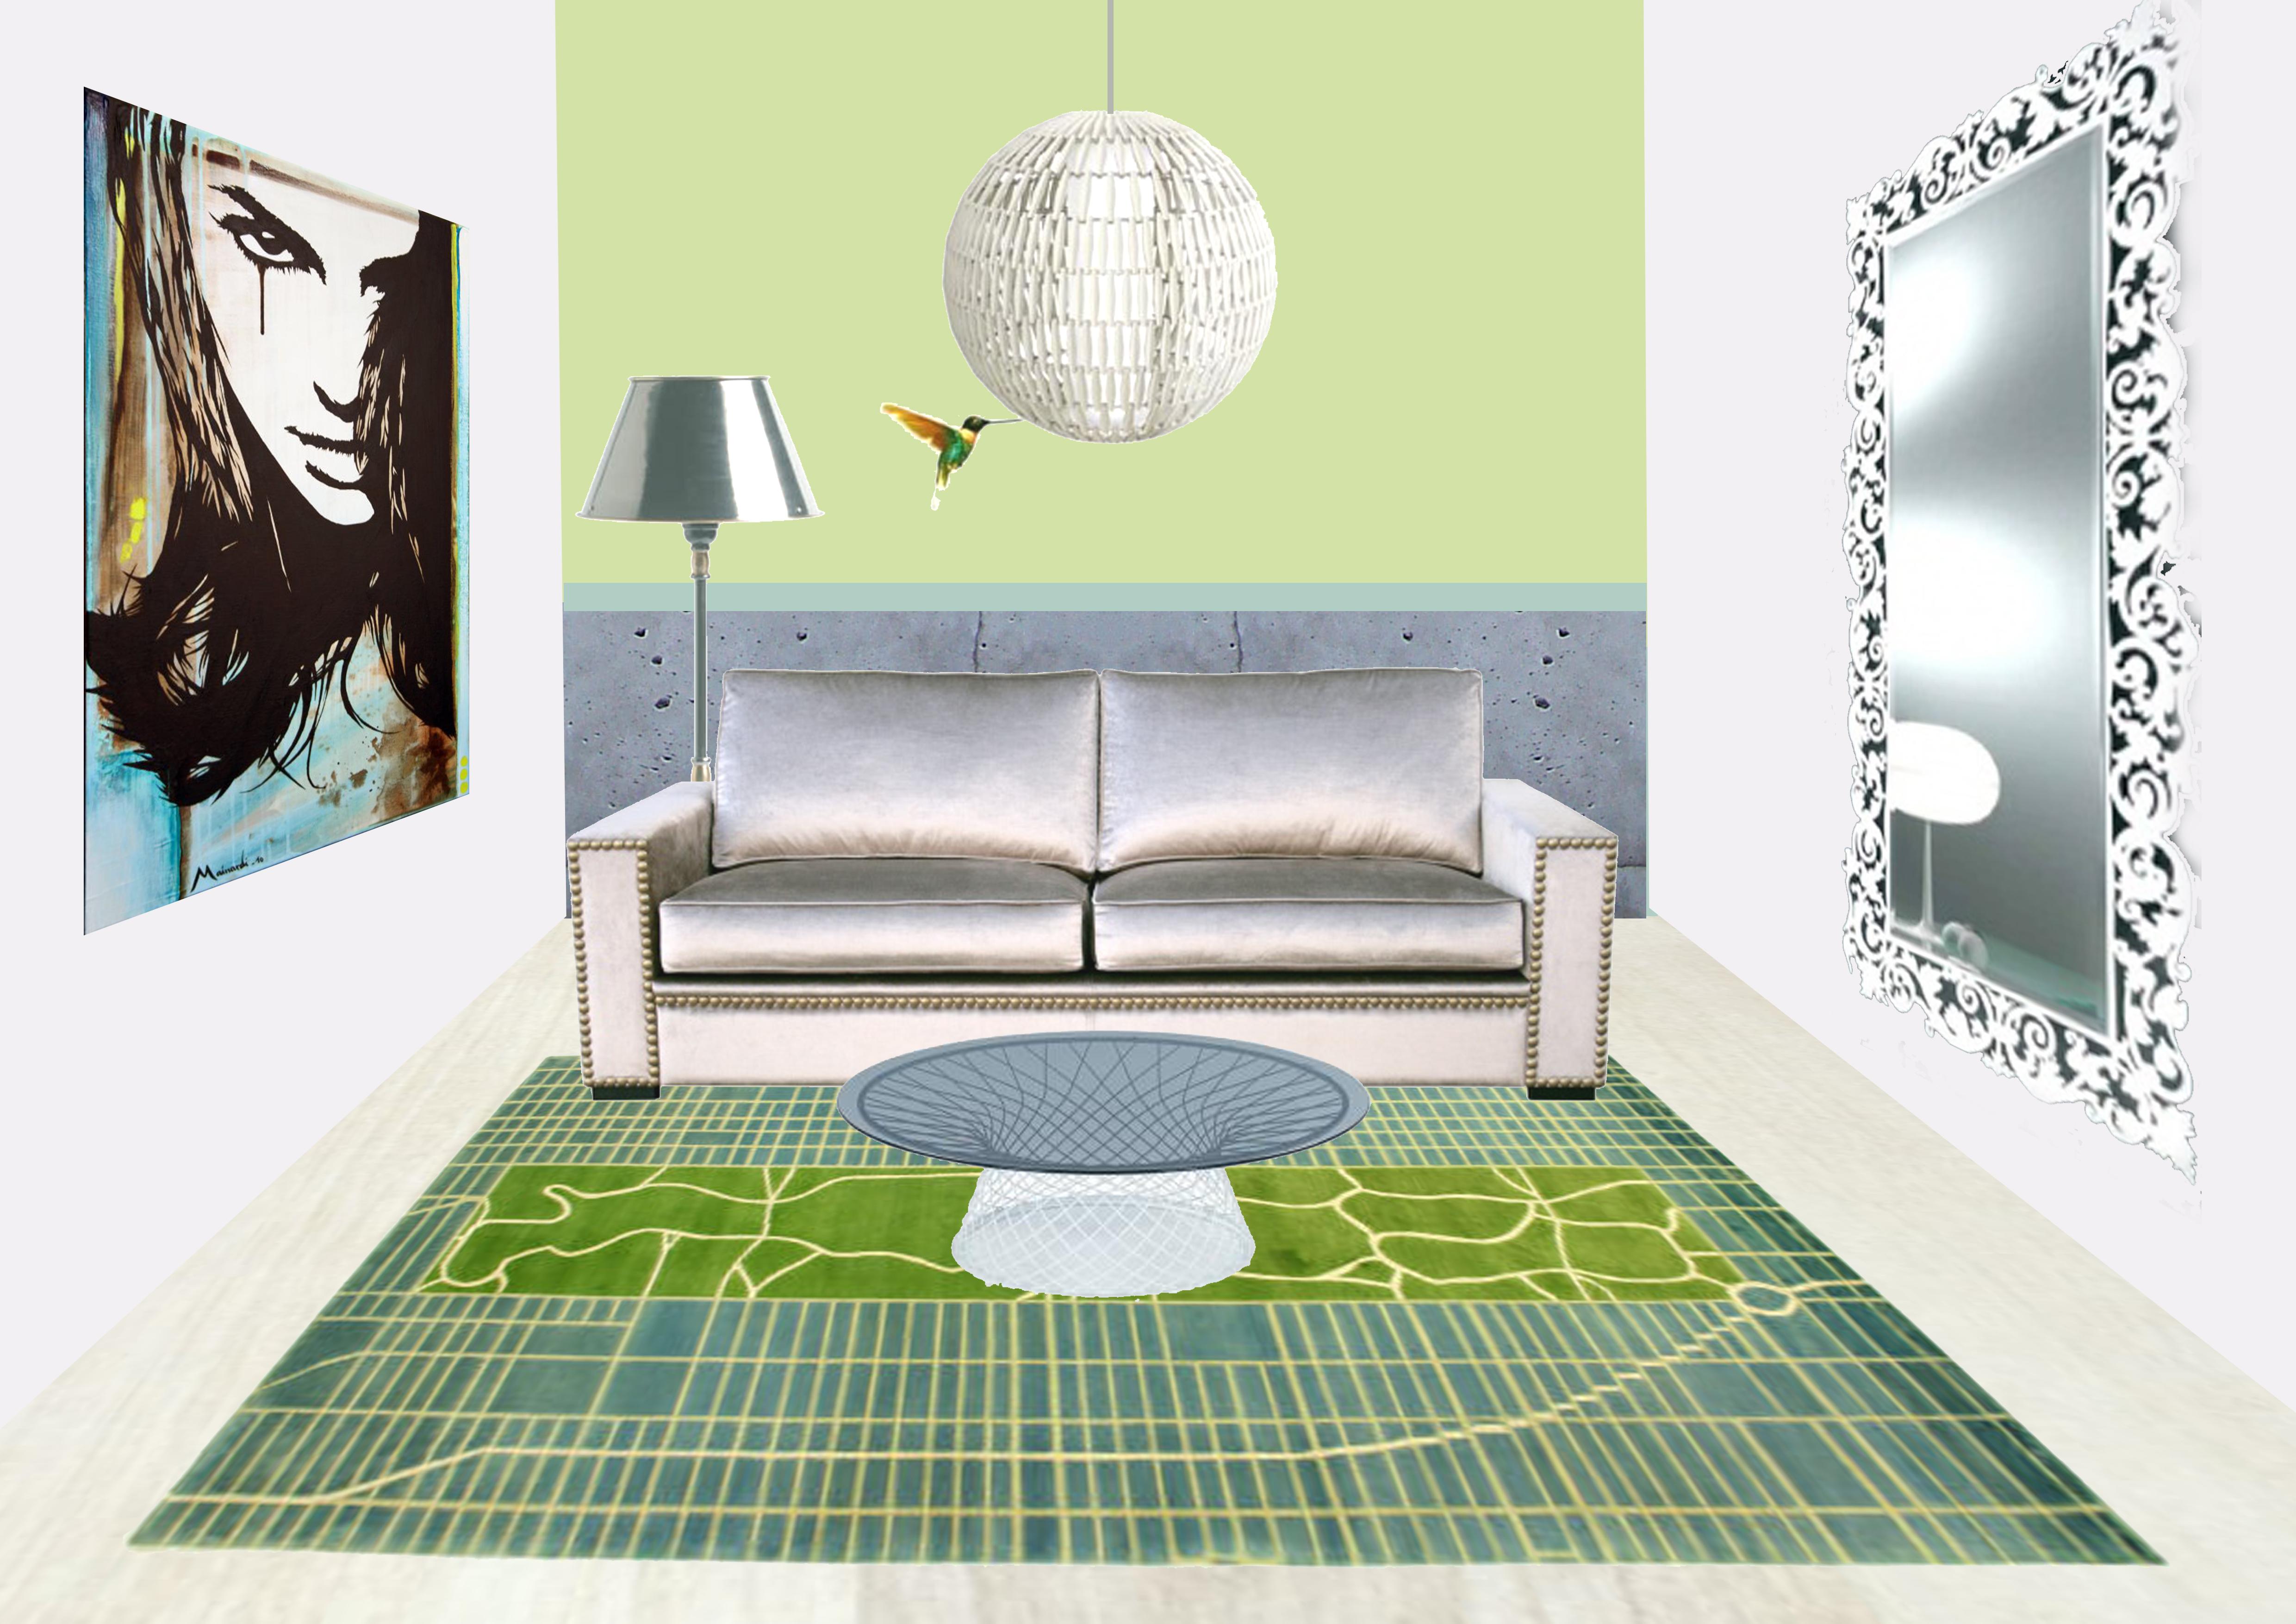 exemple de planche d ambiance. Black Bedroom Furniture Sets. Home Design Ideas